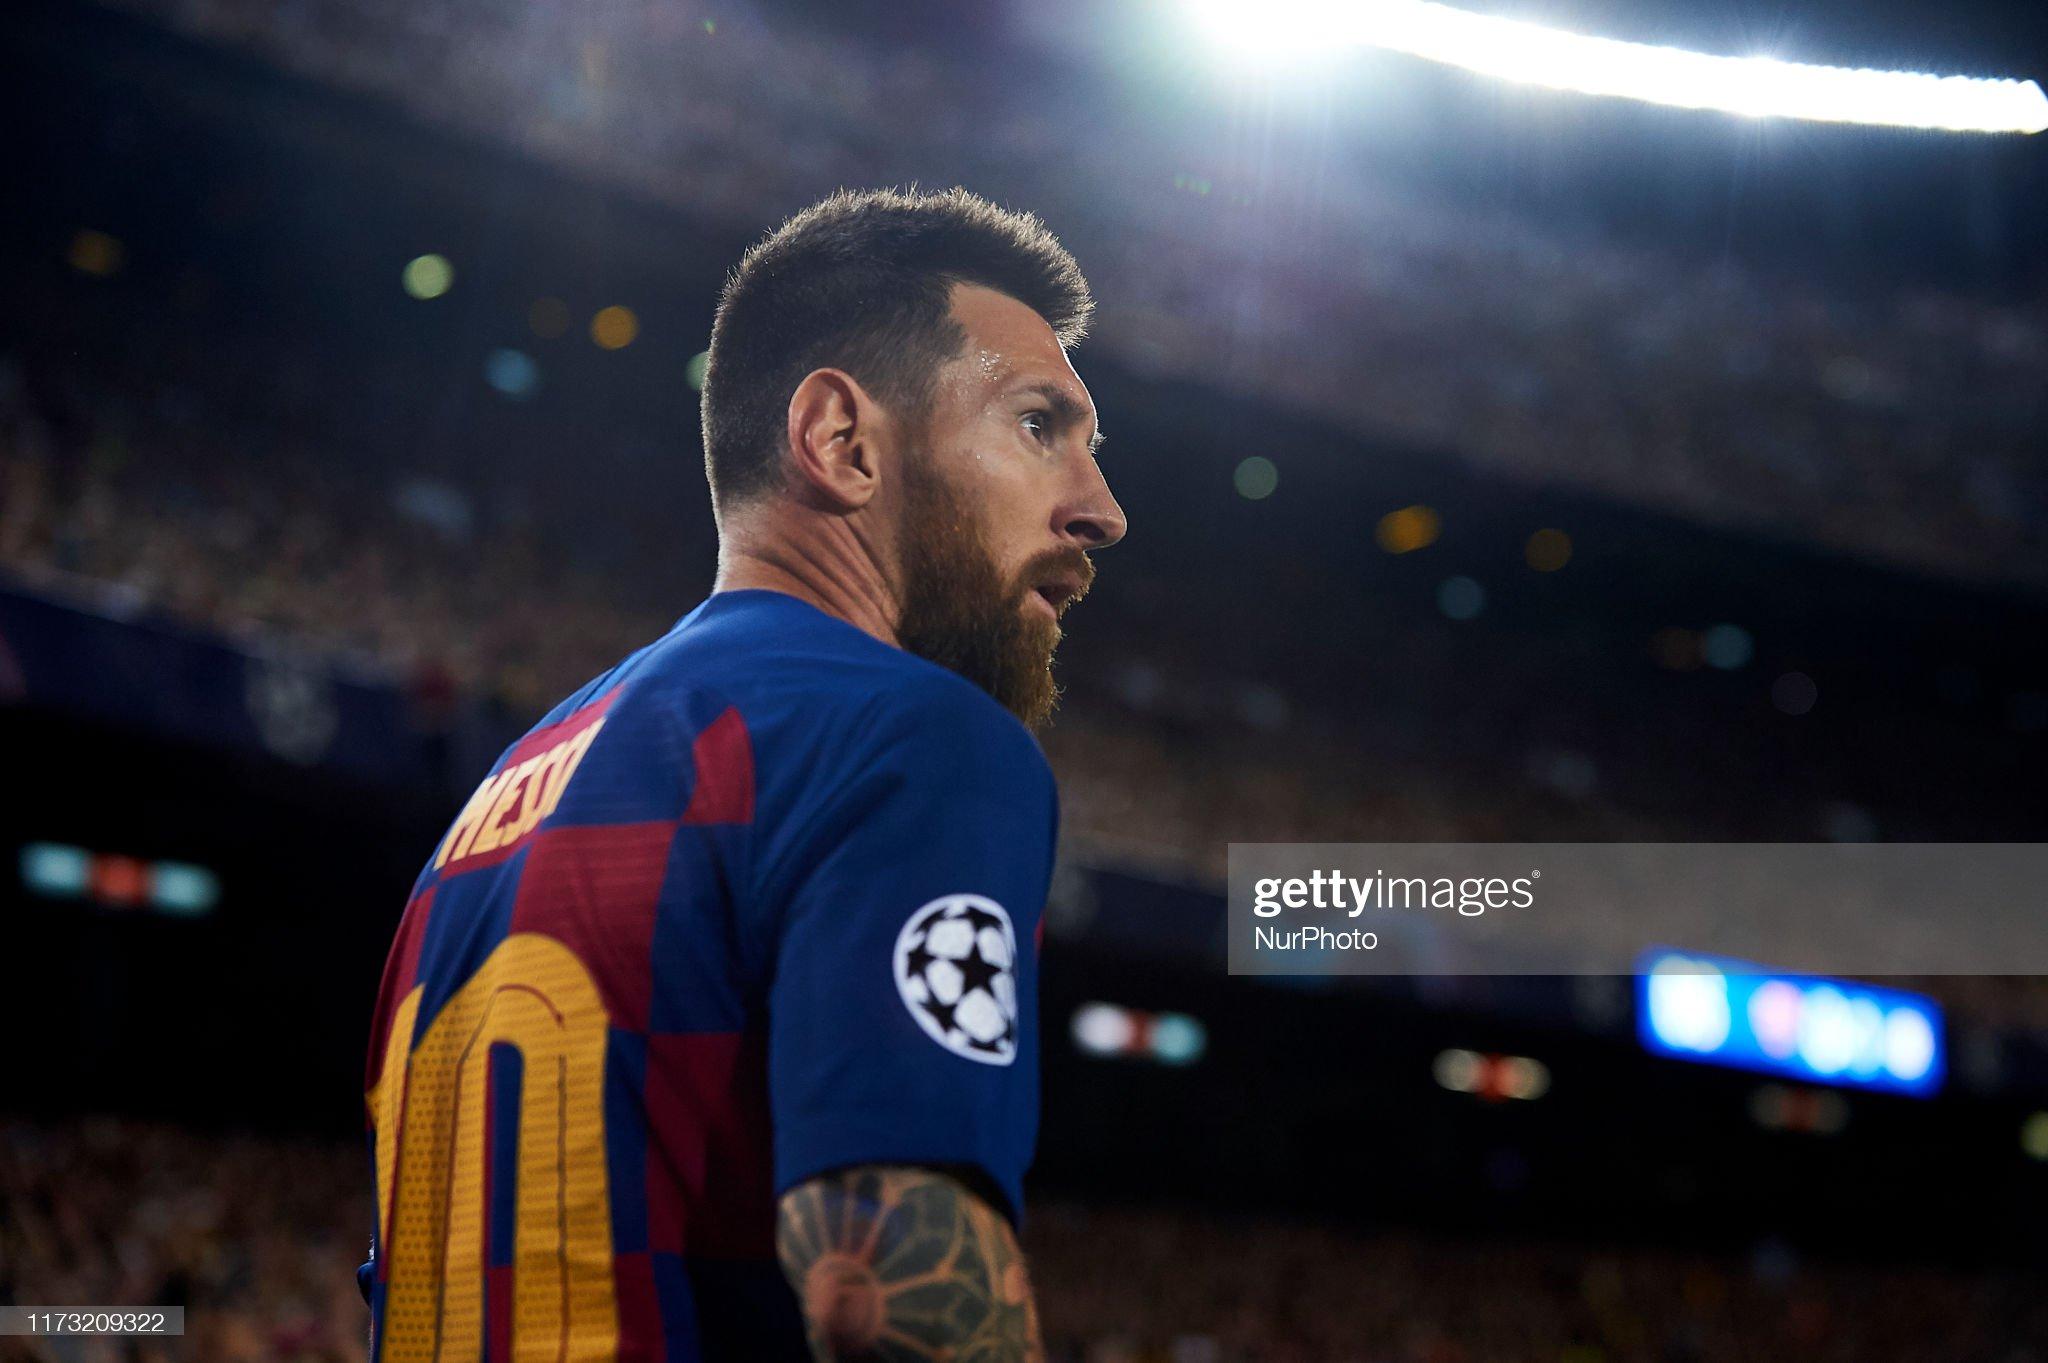 صور مباراة : برشلونة - إنتر 2-1 ( 02-10-2019 )  Lionel-messi-of-barcelona-during-the-uefa-champions-league-group-f-picture-id1173209322?s=2048x2048